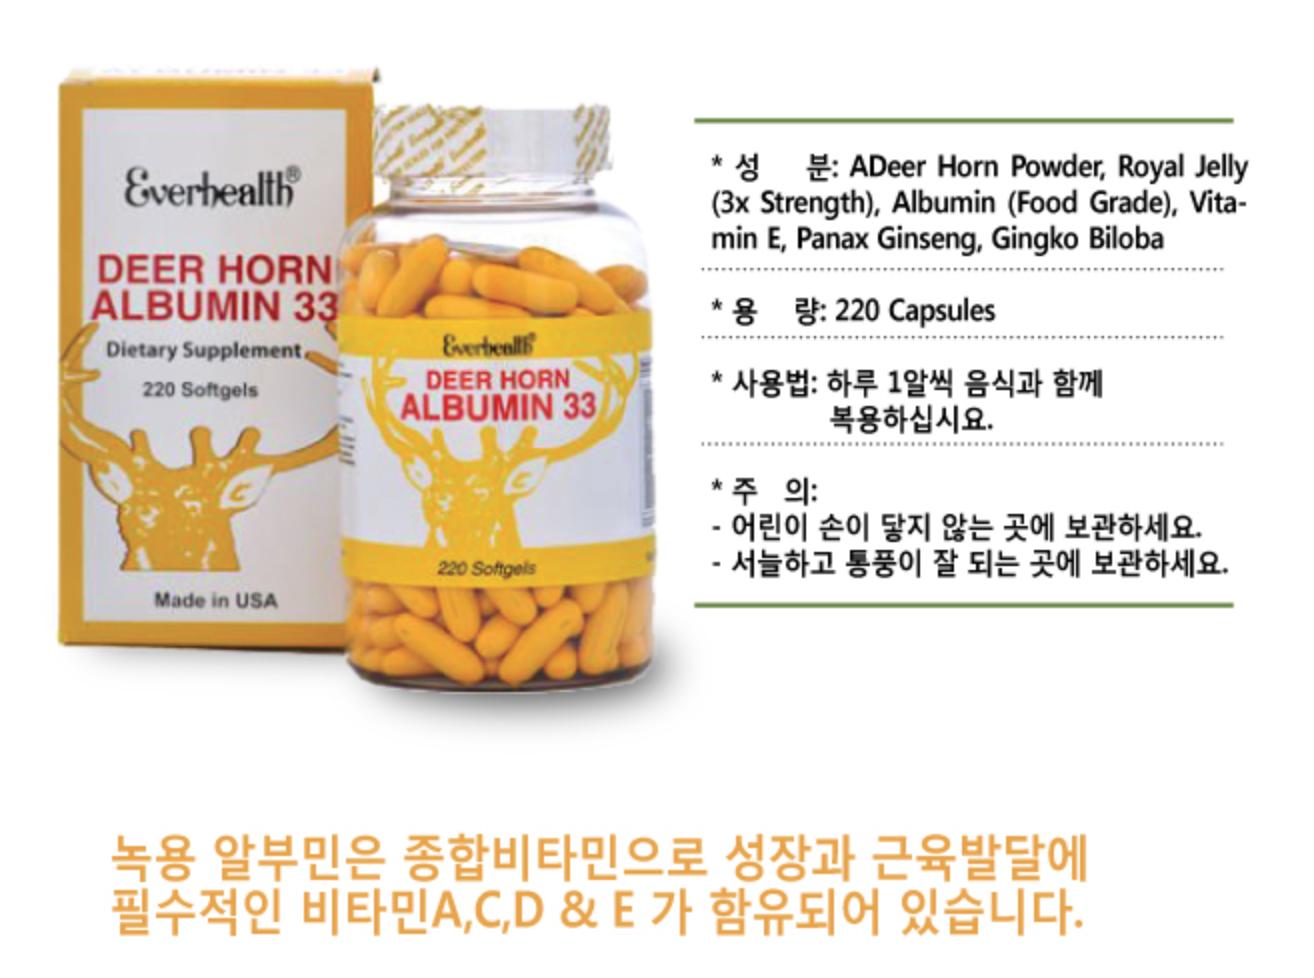 everhealth-deer-horn-albumin-33-2.png